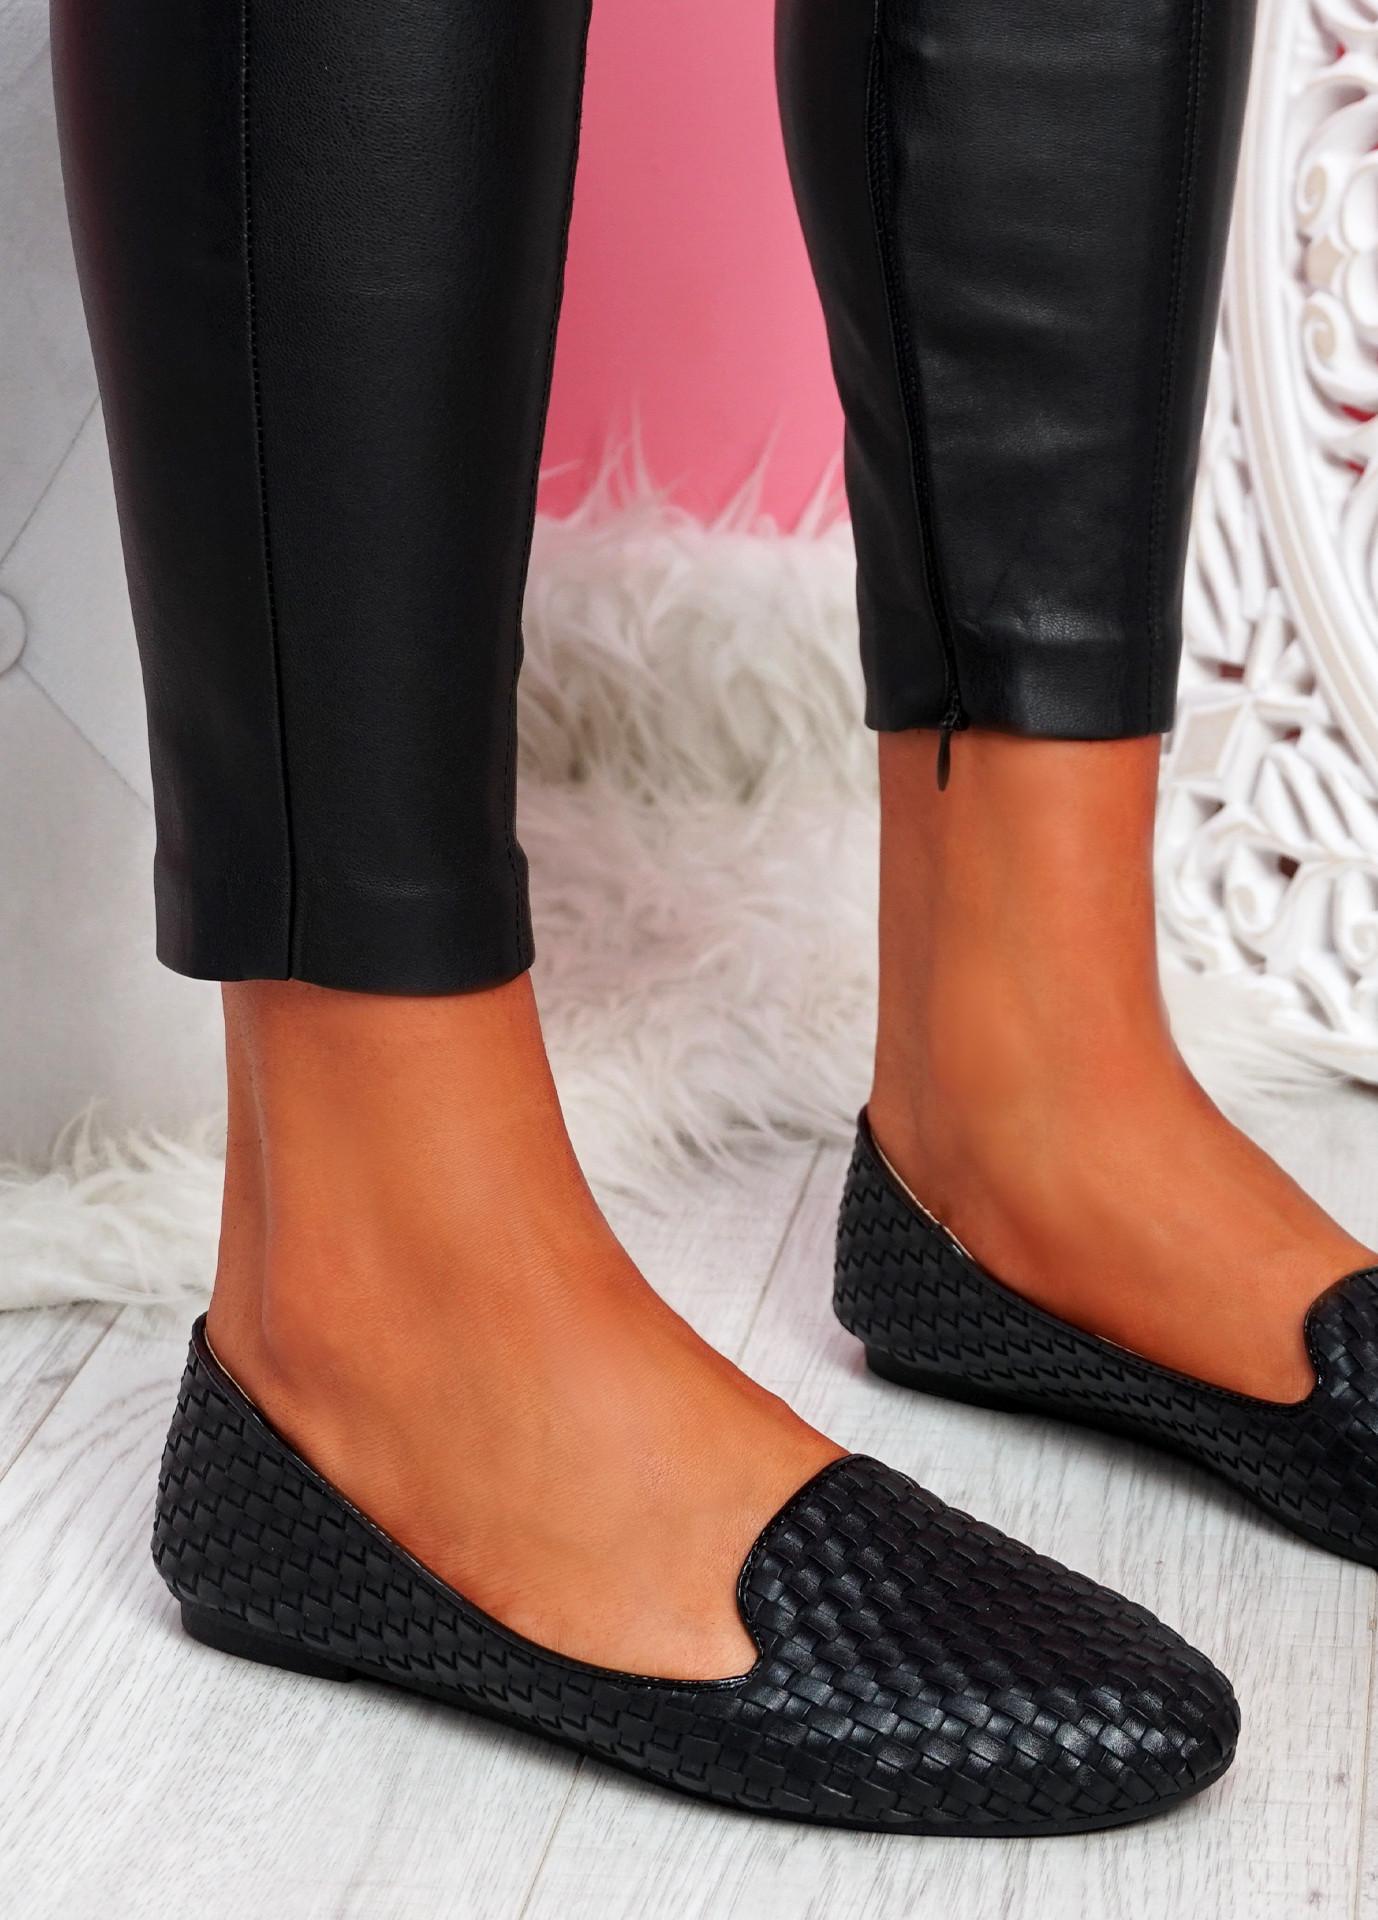 Veny Black Weave Ballerinas